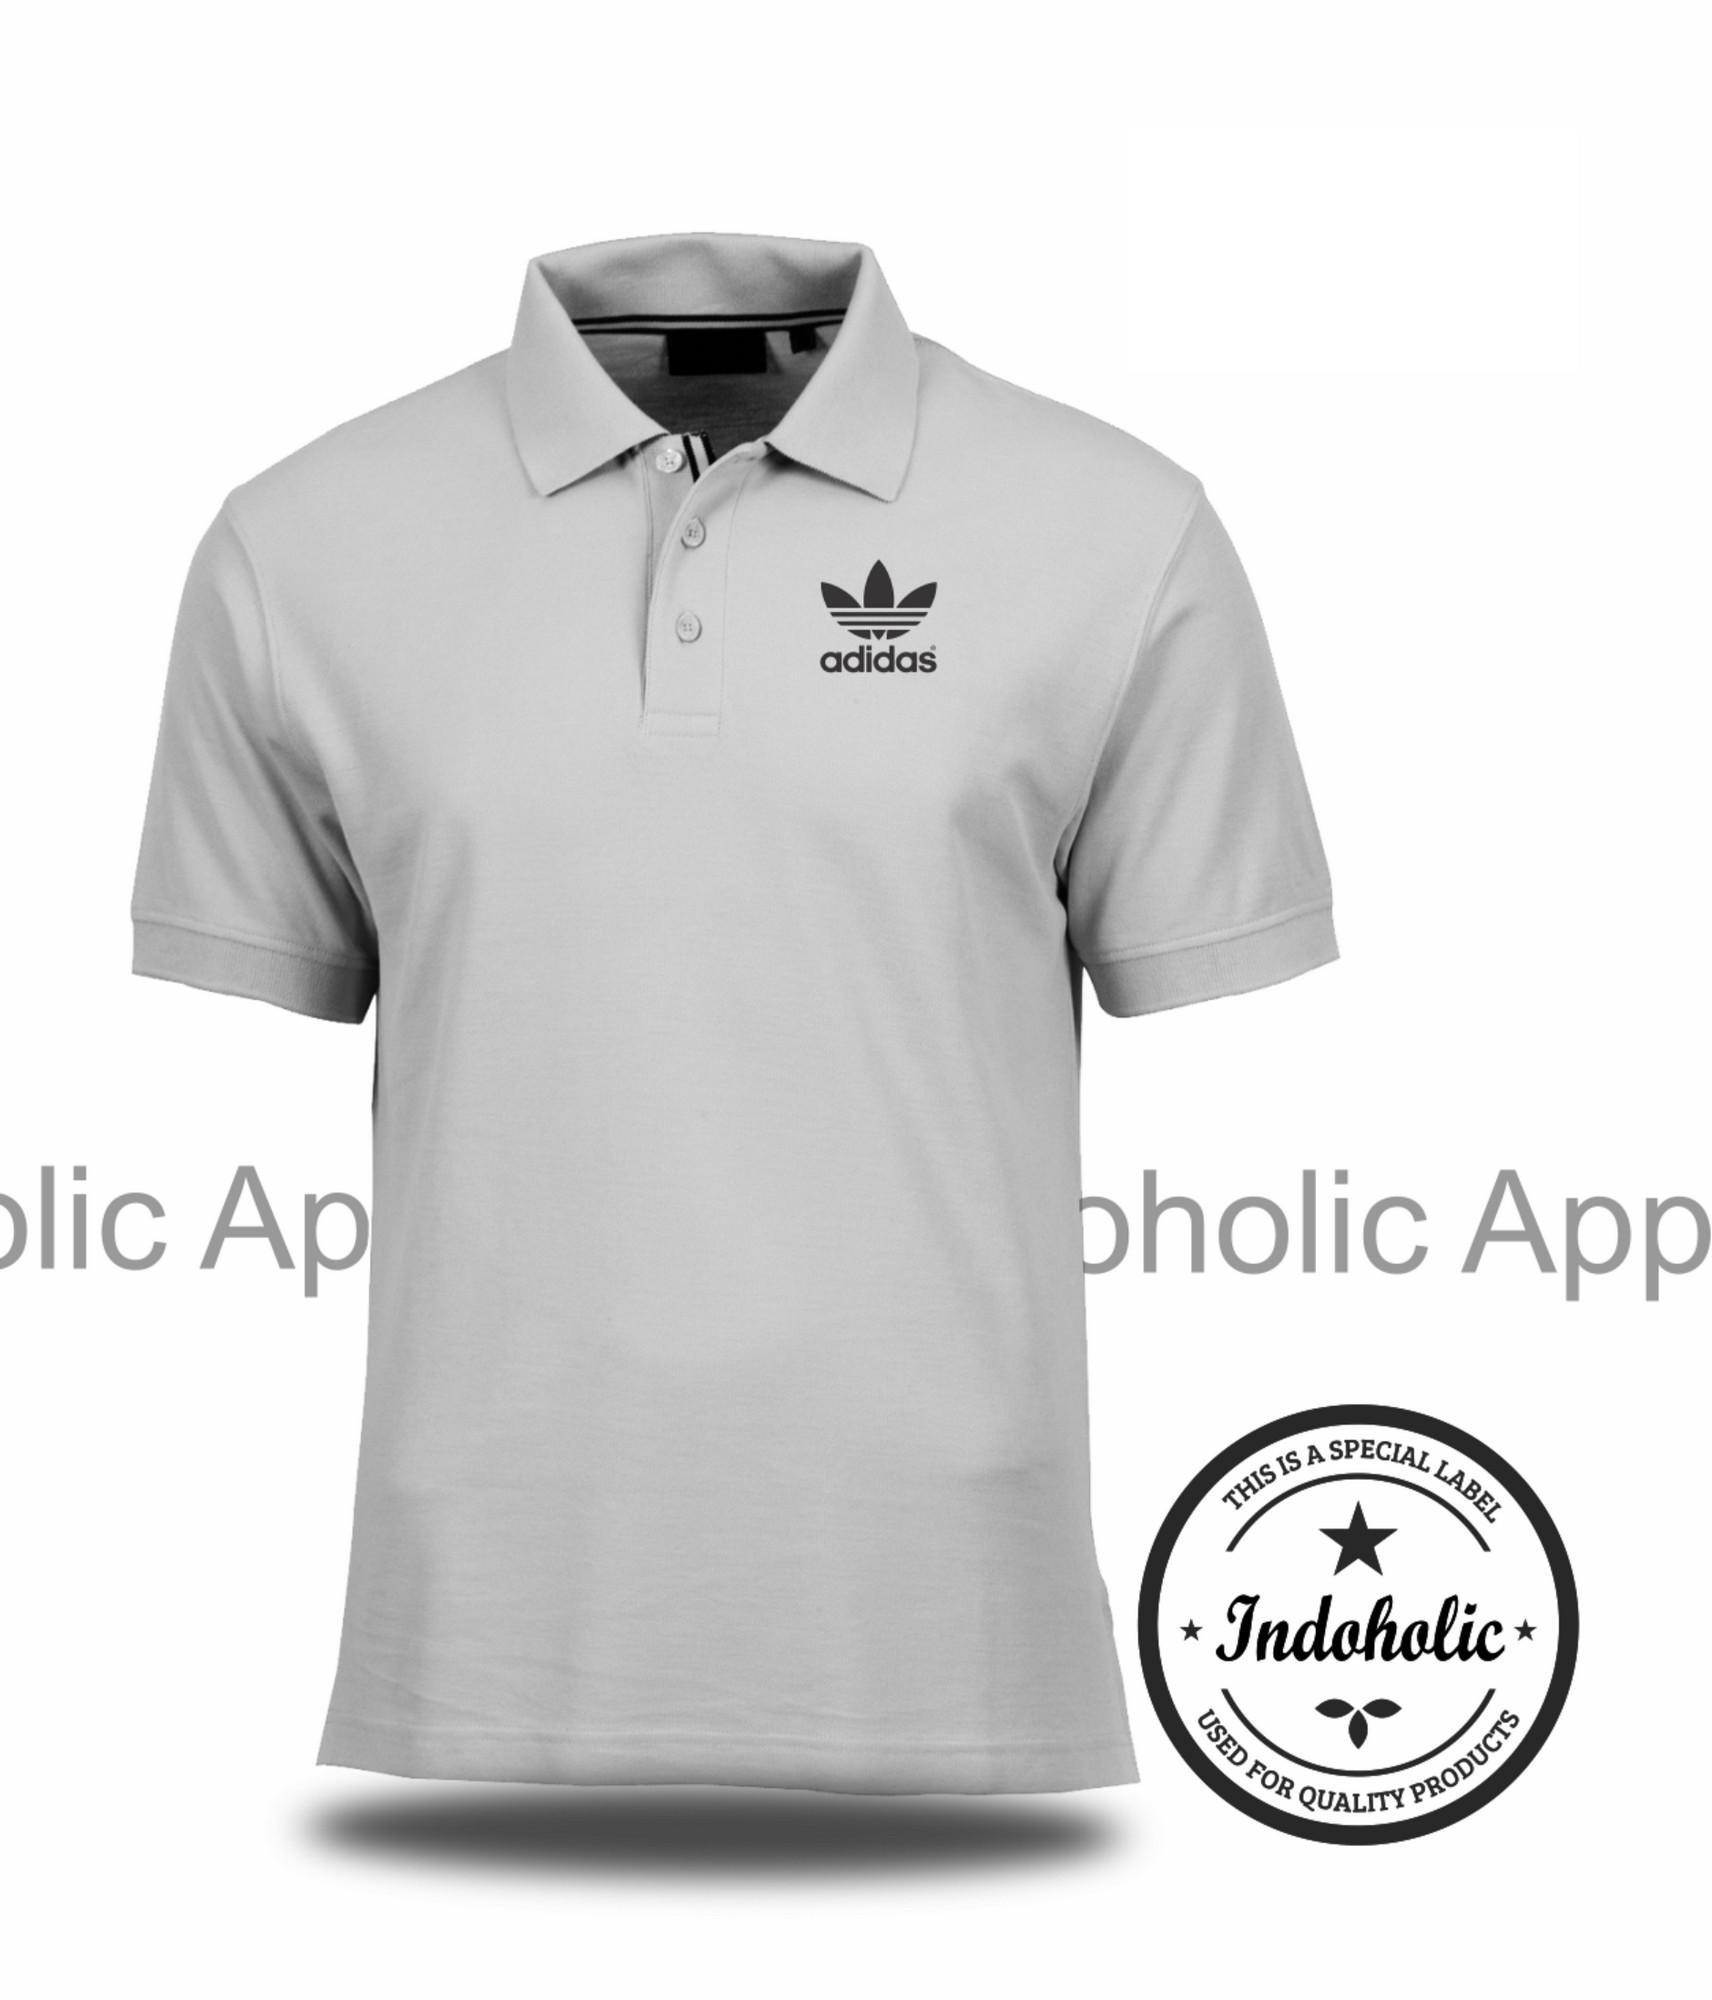 Polo Shirt Kaos Distro Sport Adidas 2 Branded T-Shirt Fashion Pria Wanita Cowok Cewek Baju T-Shirt Jakarta Bandung Terbaru Jaman Now Kekinian Atasan Pakaian Polos Pendek Kerah Berkera